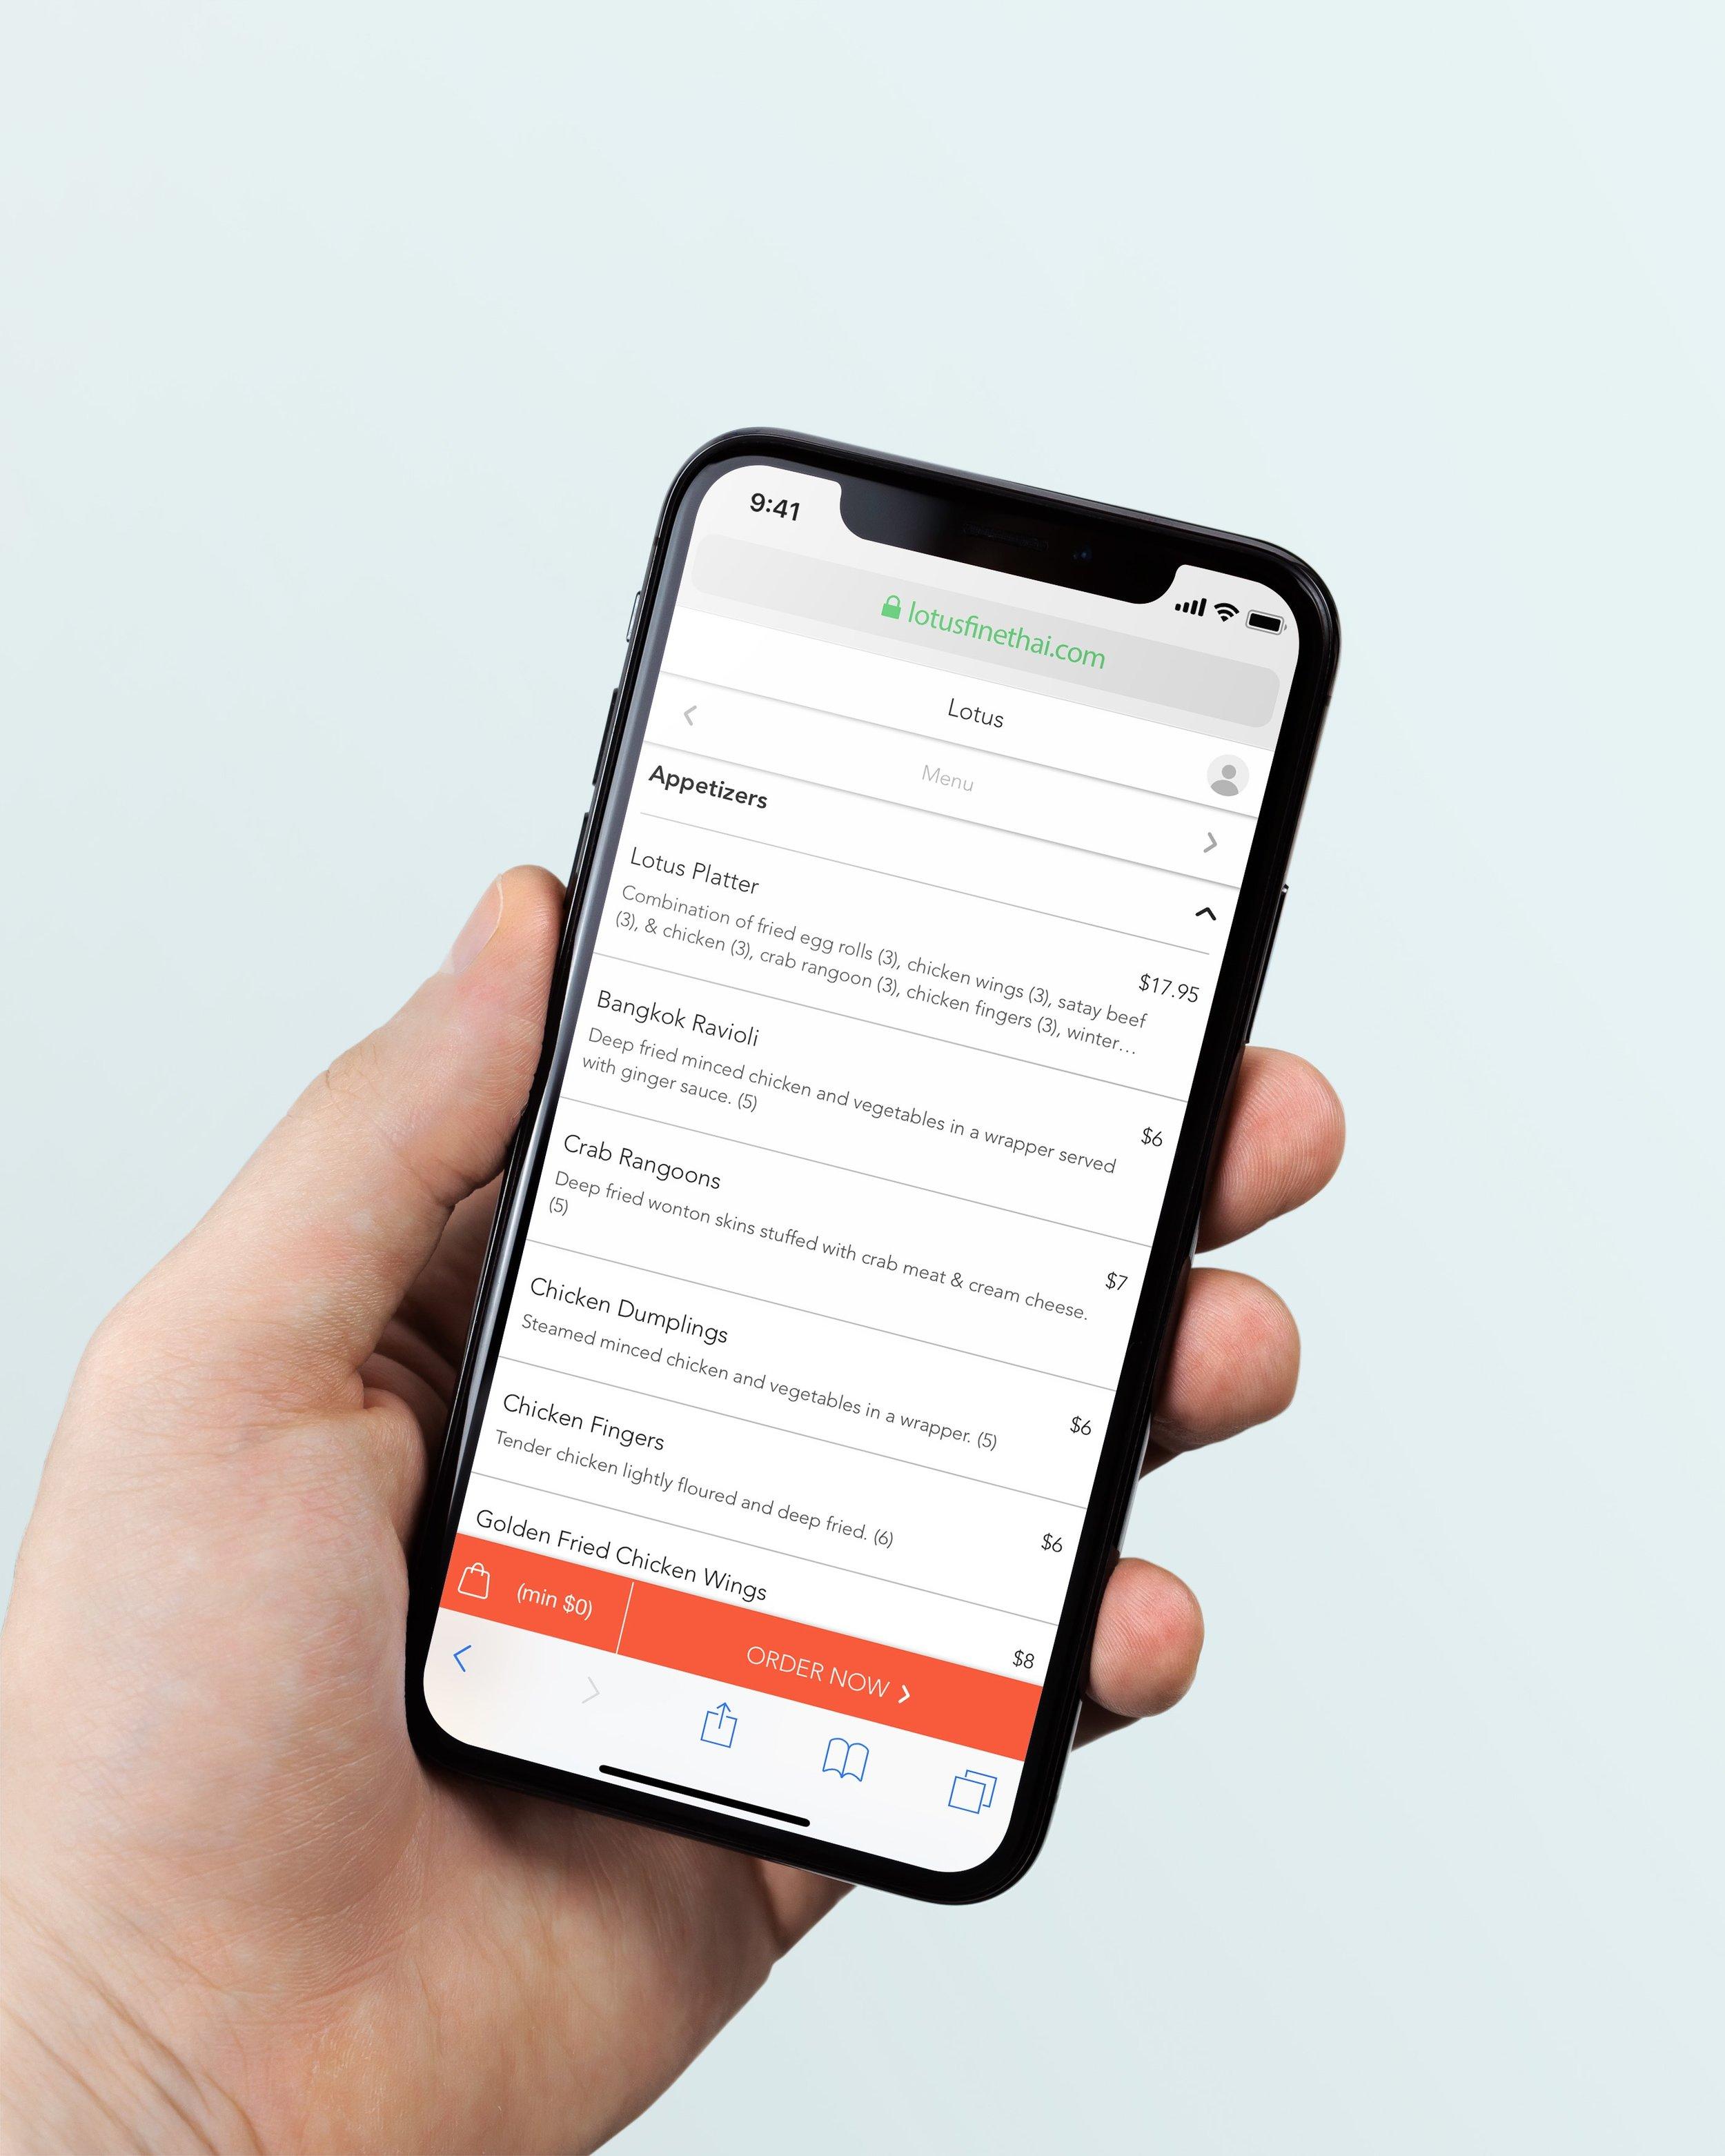 Iphone X in Hand Mockup SM.jpg